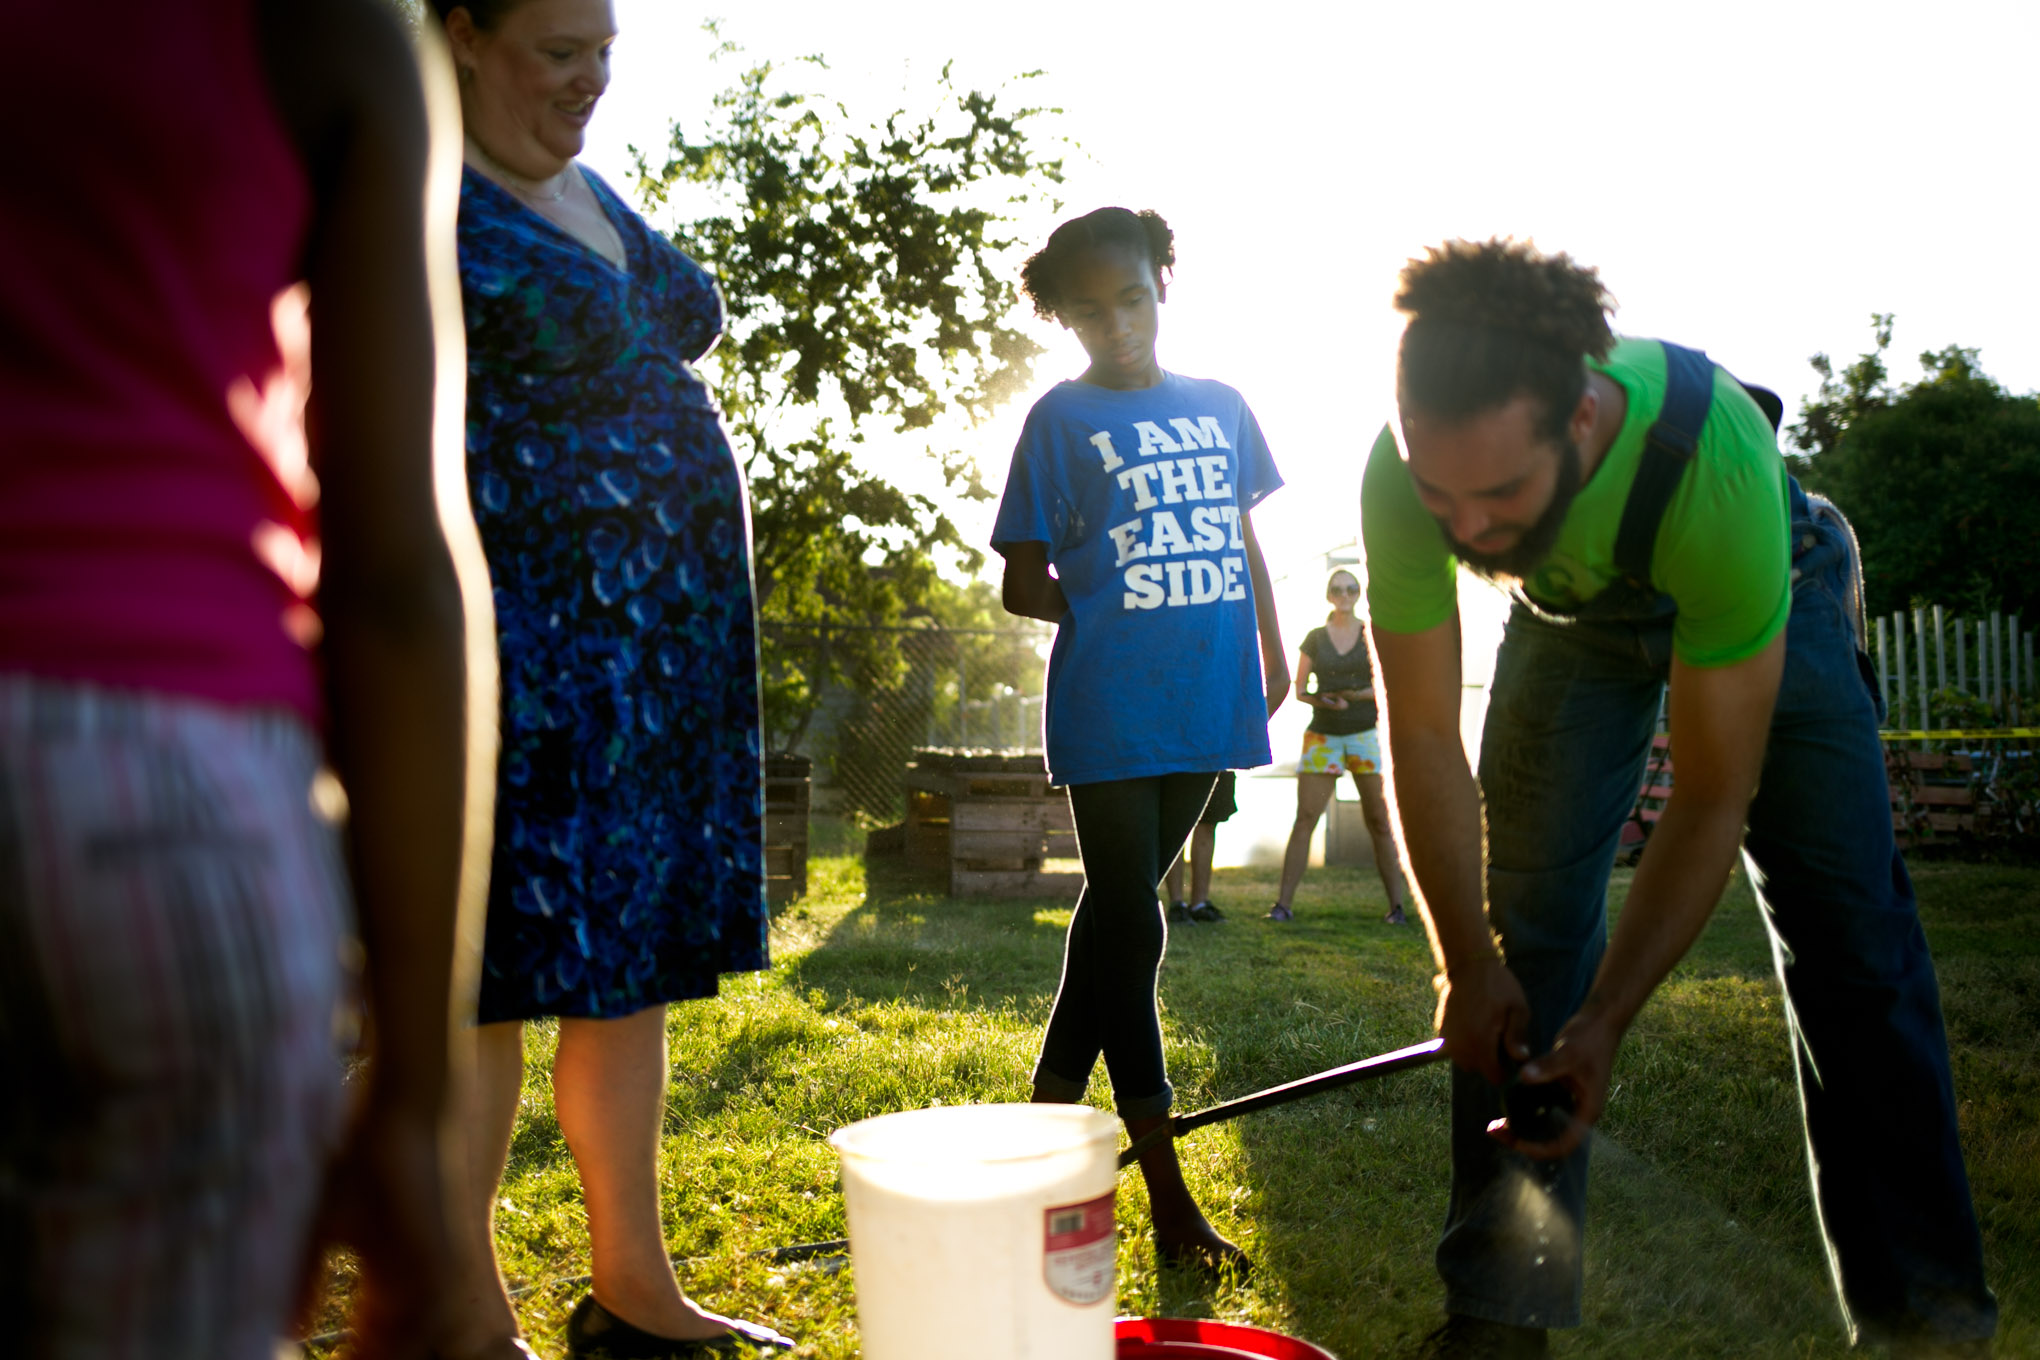 Kionna watches Gardopia founder Stephen Lucke prepare water for the chickens. Photo by Kathryn Boyd-Batstone.